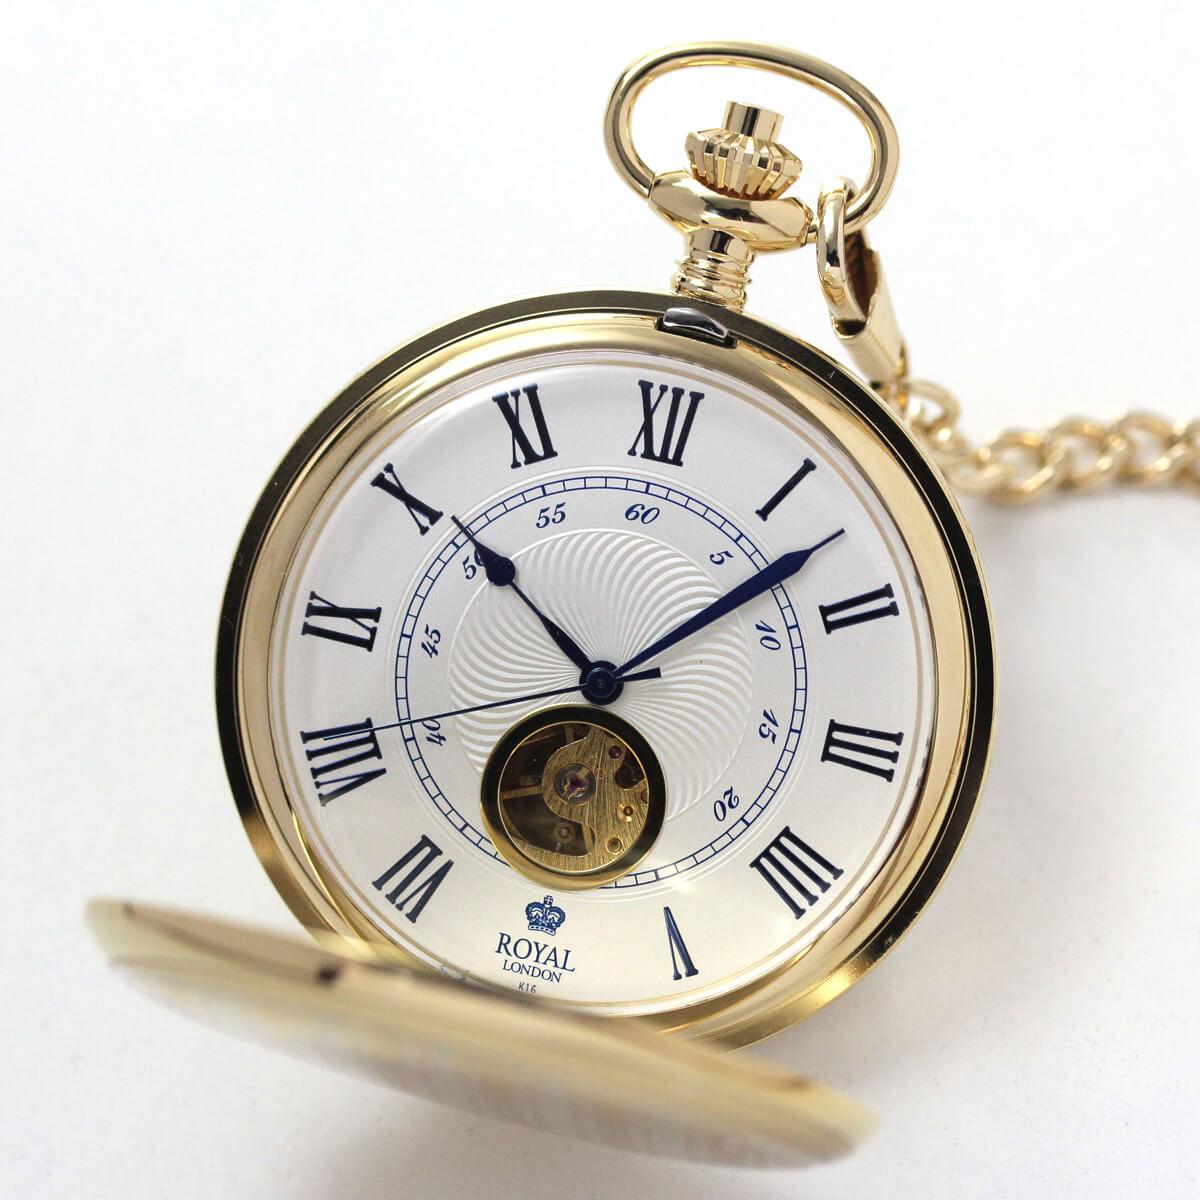 ROYAL LONDON(ロイヤルロンドン) 手巻きスケルトン懐中時計 90051-02